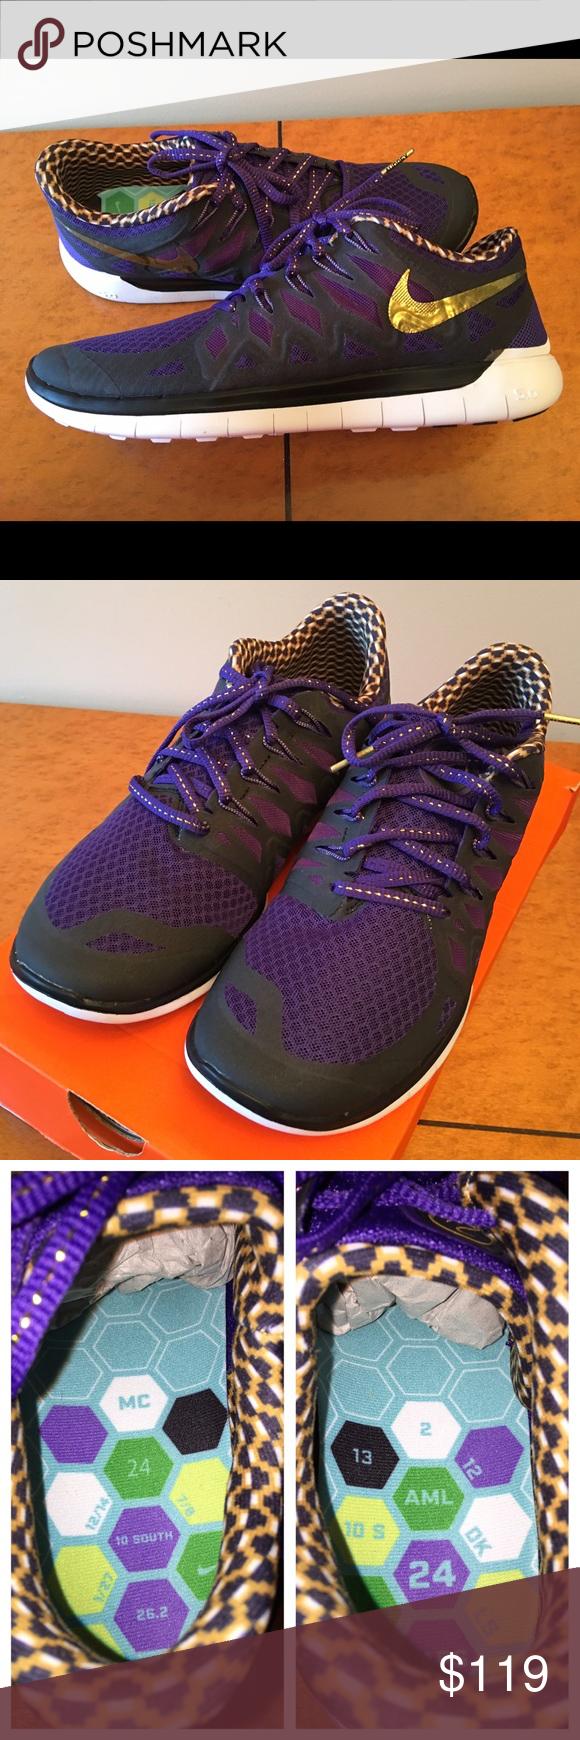 e058714c8a313 Nike Free 5.0 DB Doernbecher Tim Haarmann New with box. Style 725566-580.